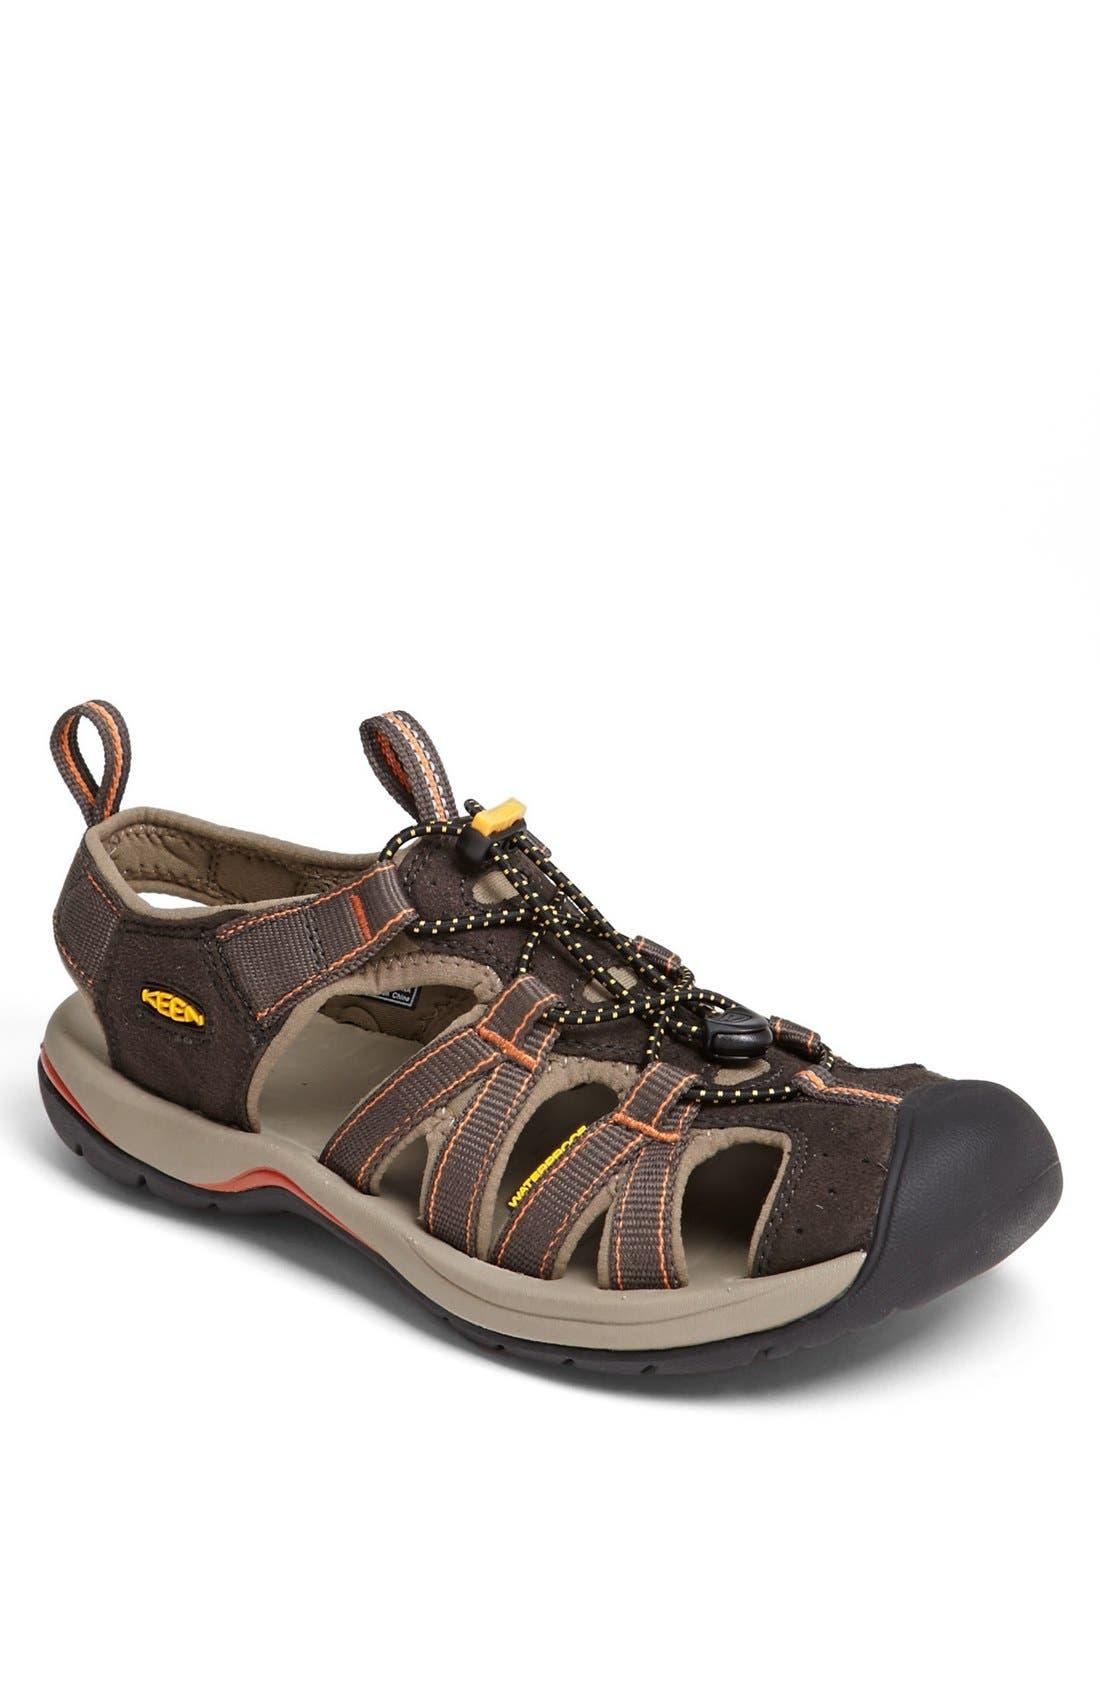 Alternate Image 1 Selected - Keen 'Kanyon' Waterproof Sandal (Men)